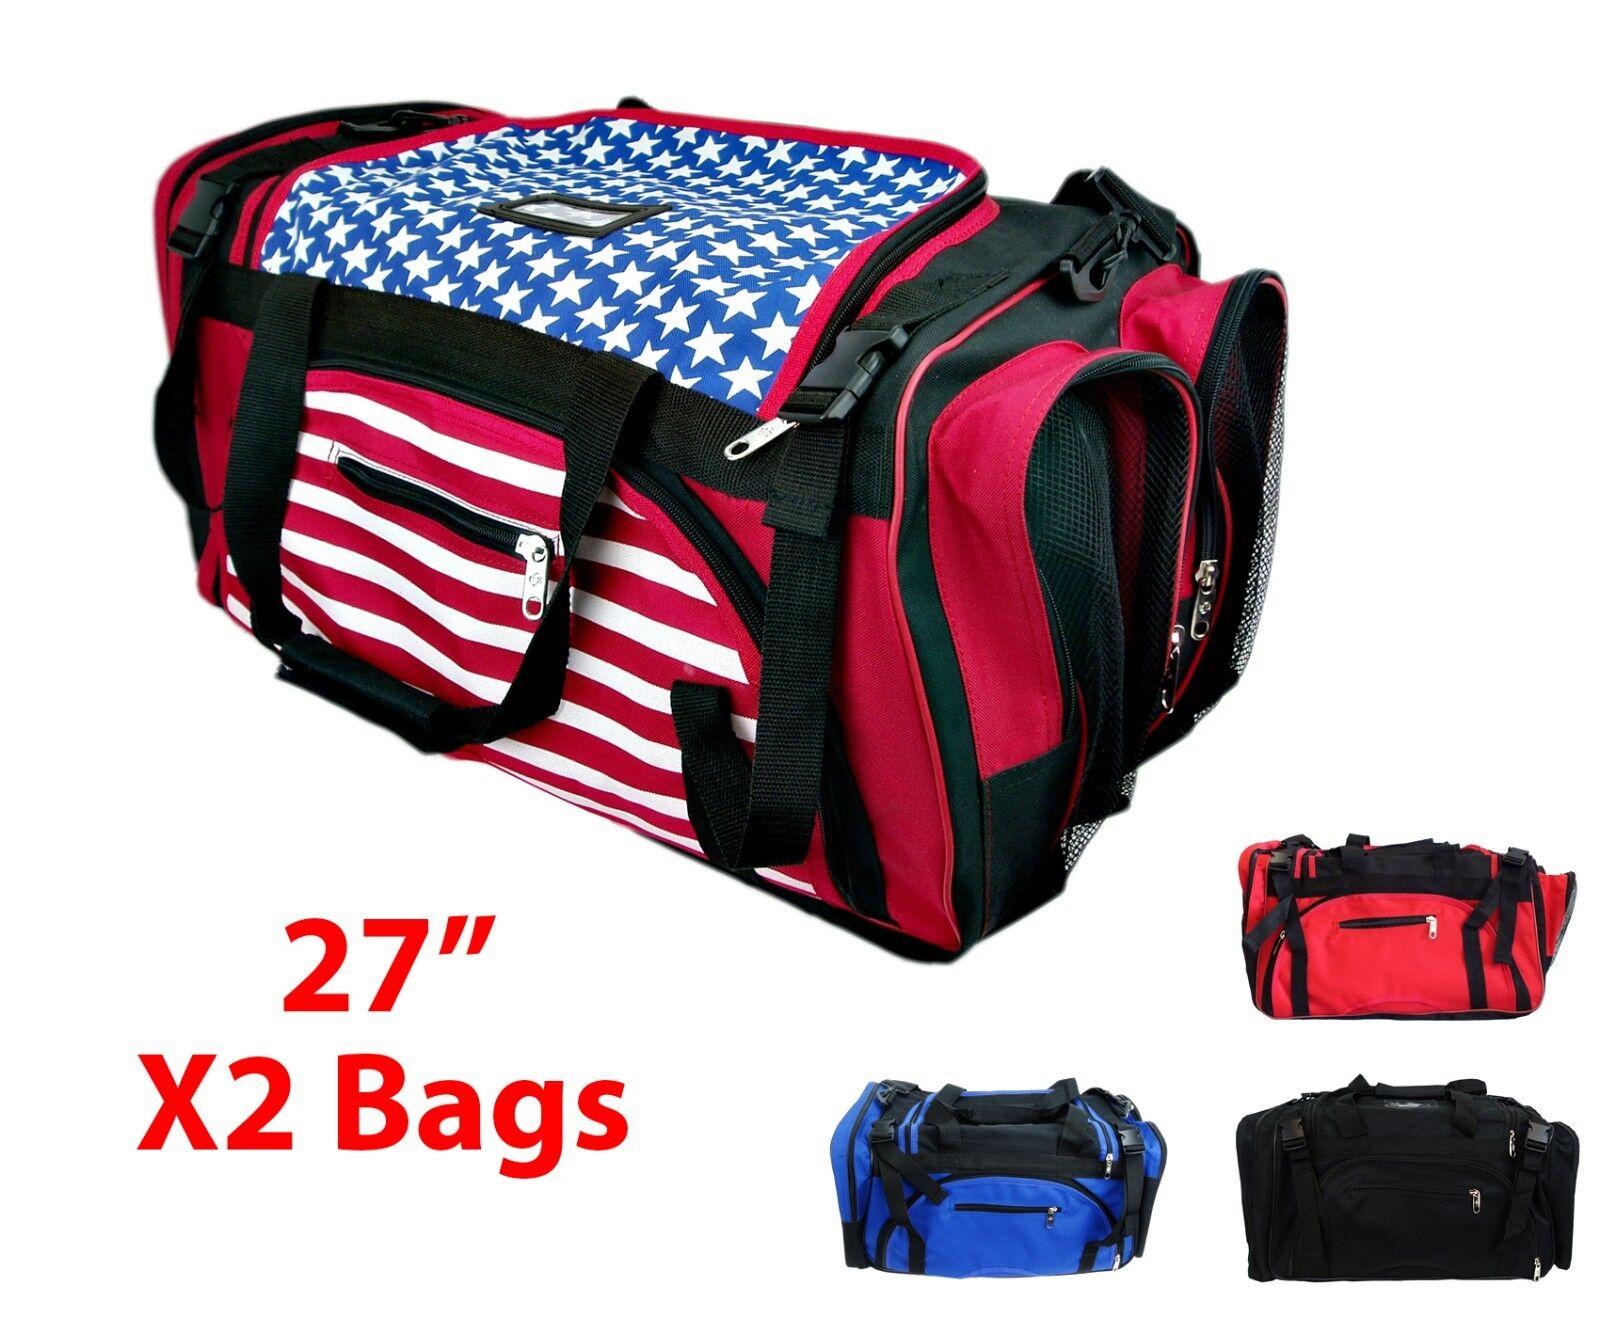 X2  Equipment Gear Bag Taekwondo Karate MMA Martial Arts Deluxe 27  Travel Bag  100% brand new with original quality